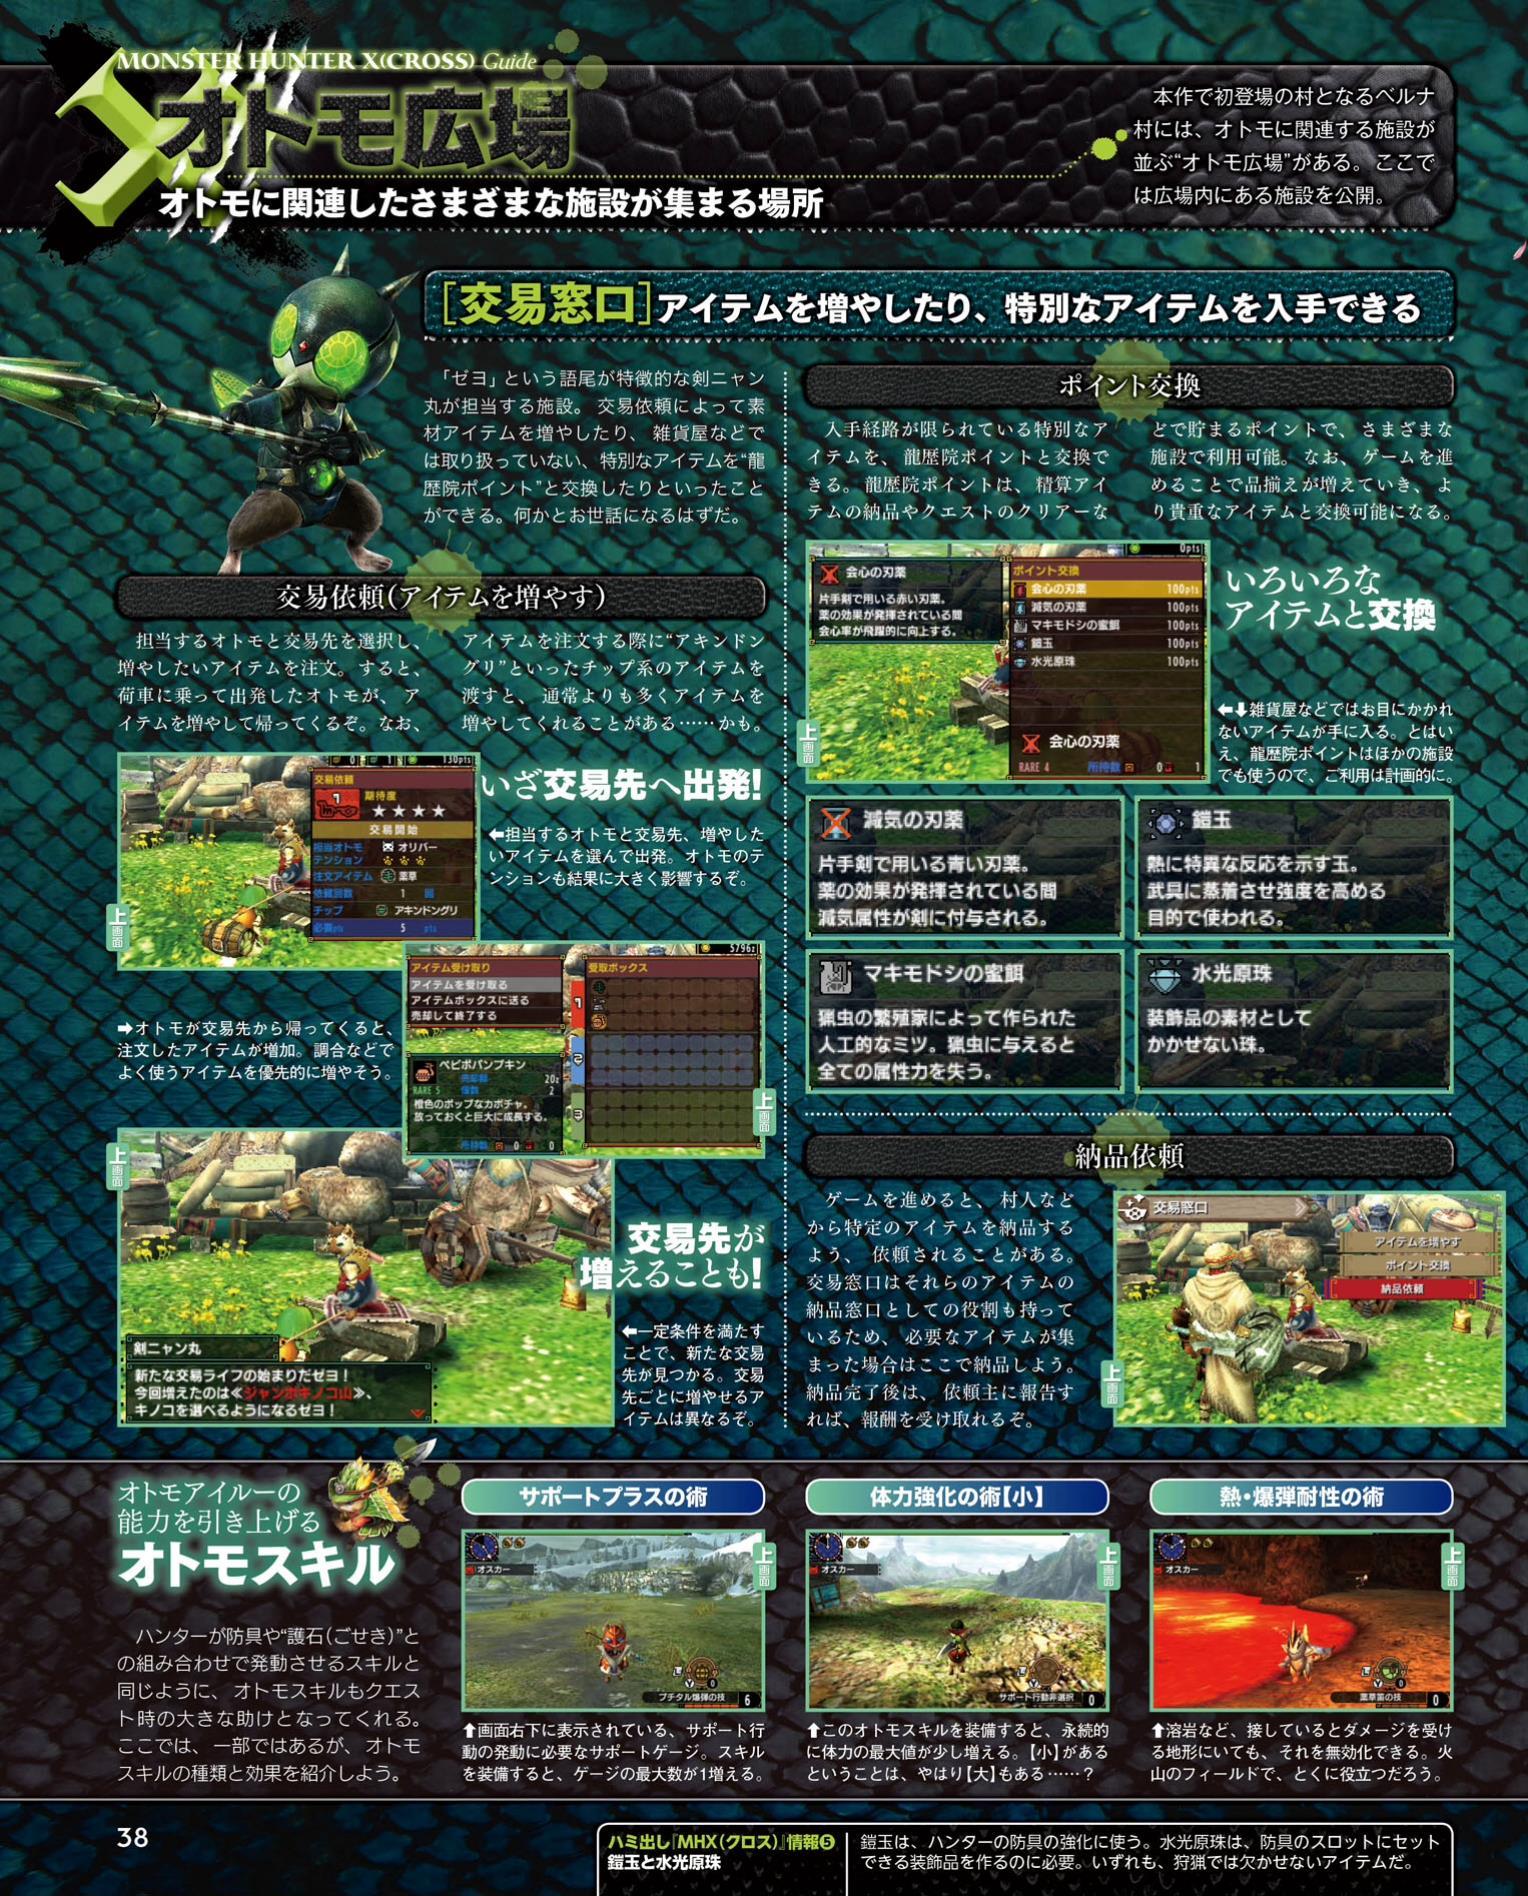 Scans roundup - Dragon Quest Monsters: Joker 3, Monster Hunter X